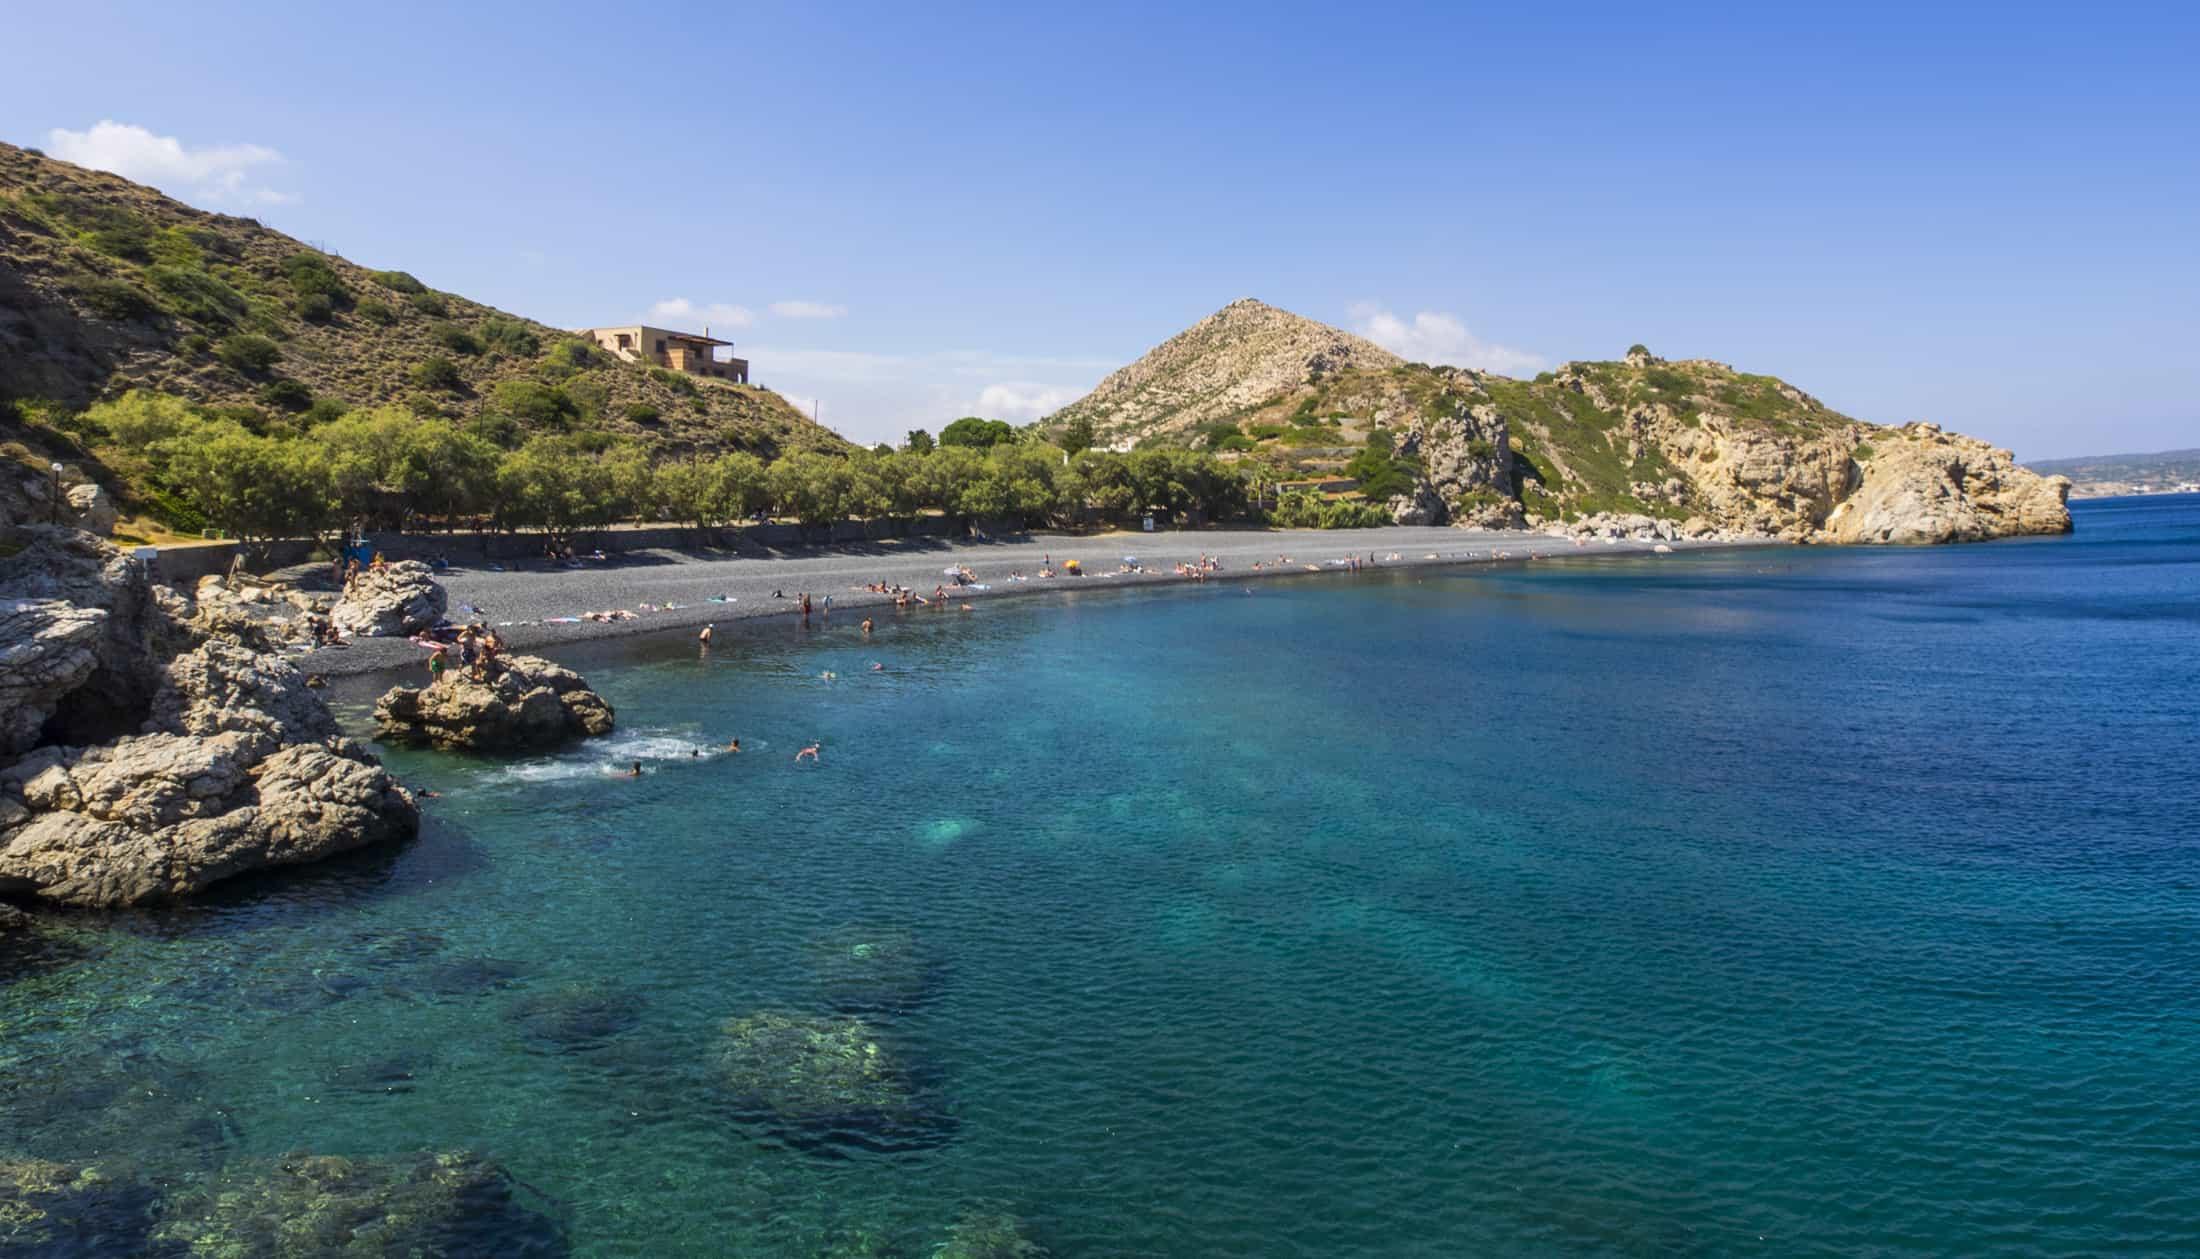 Chios Island Greece Agreekadventure Adventure Travel Blog